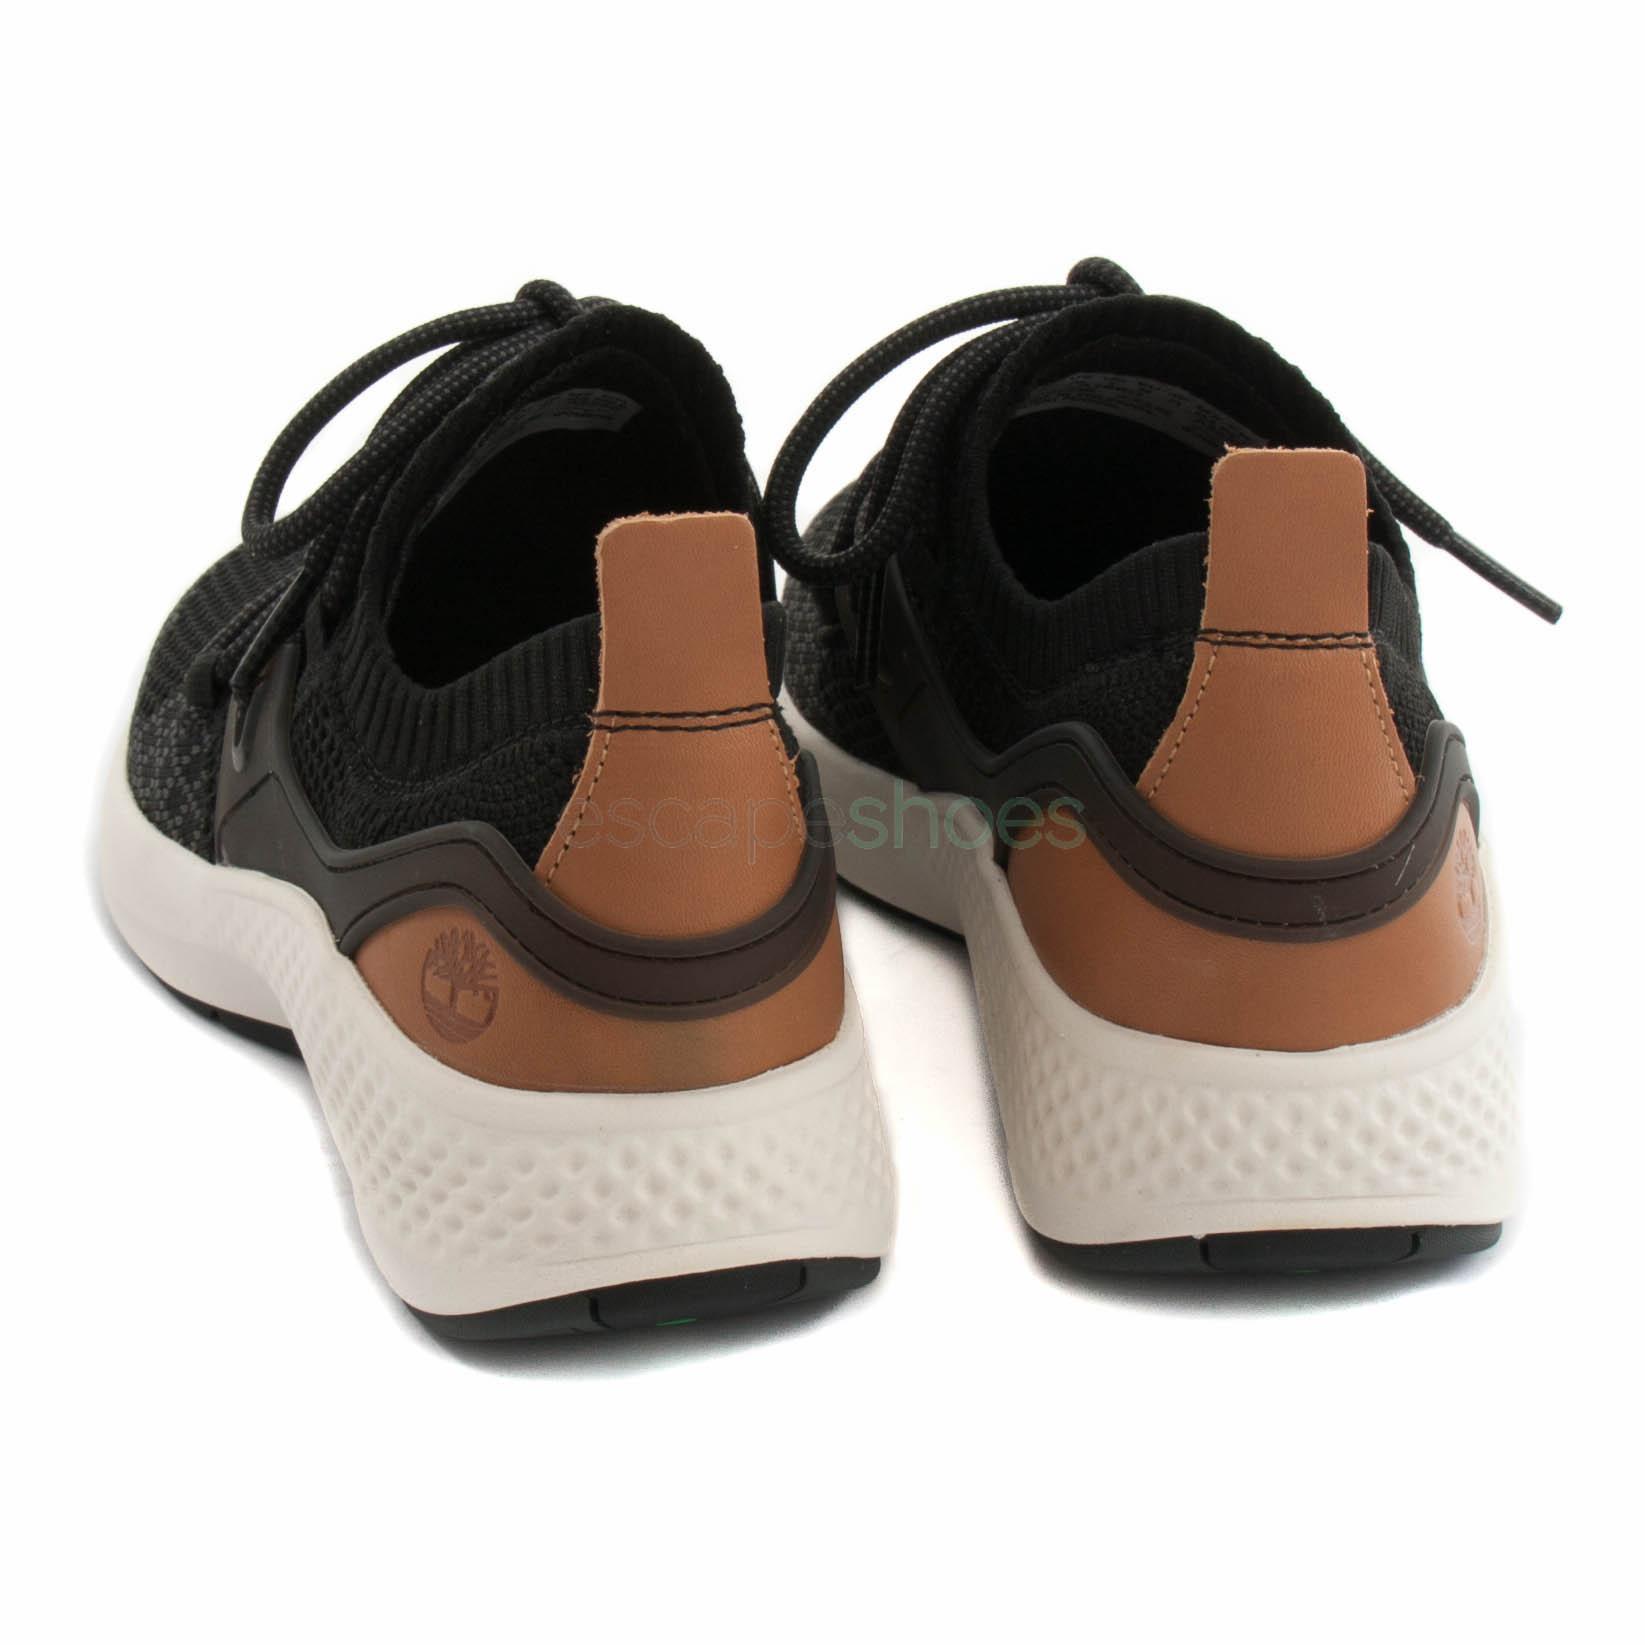 timberland flyroam go knit chukka sneakers